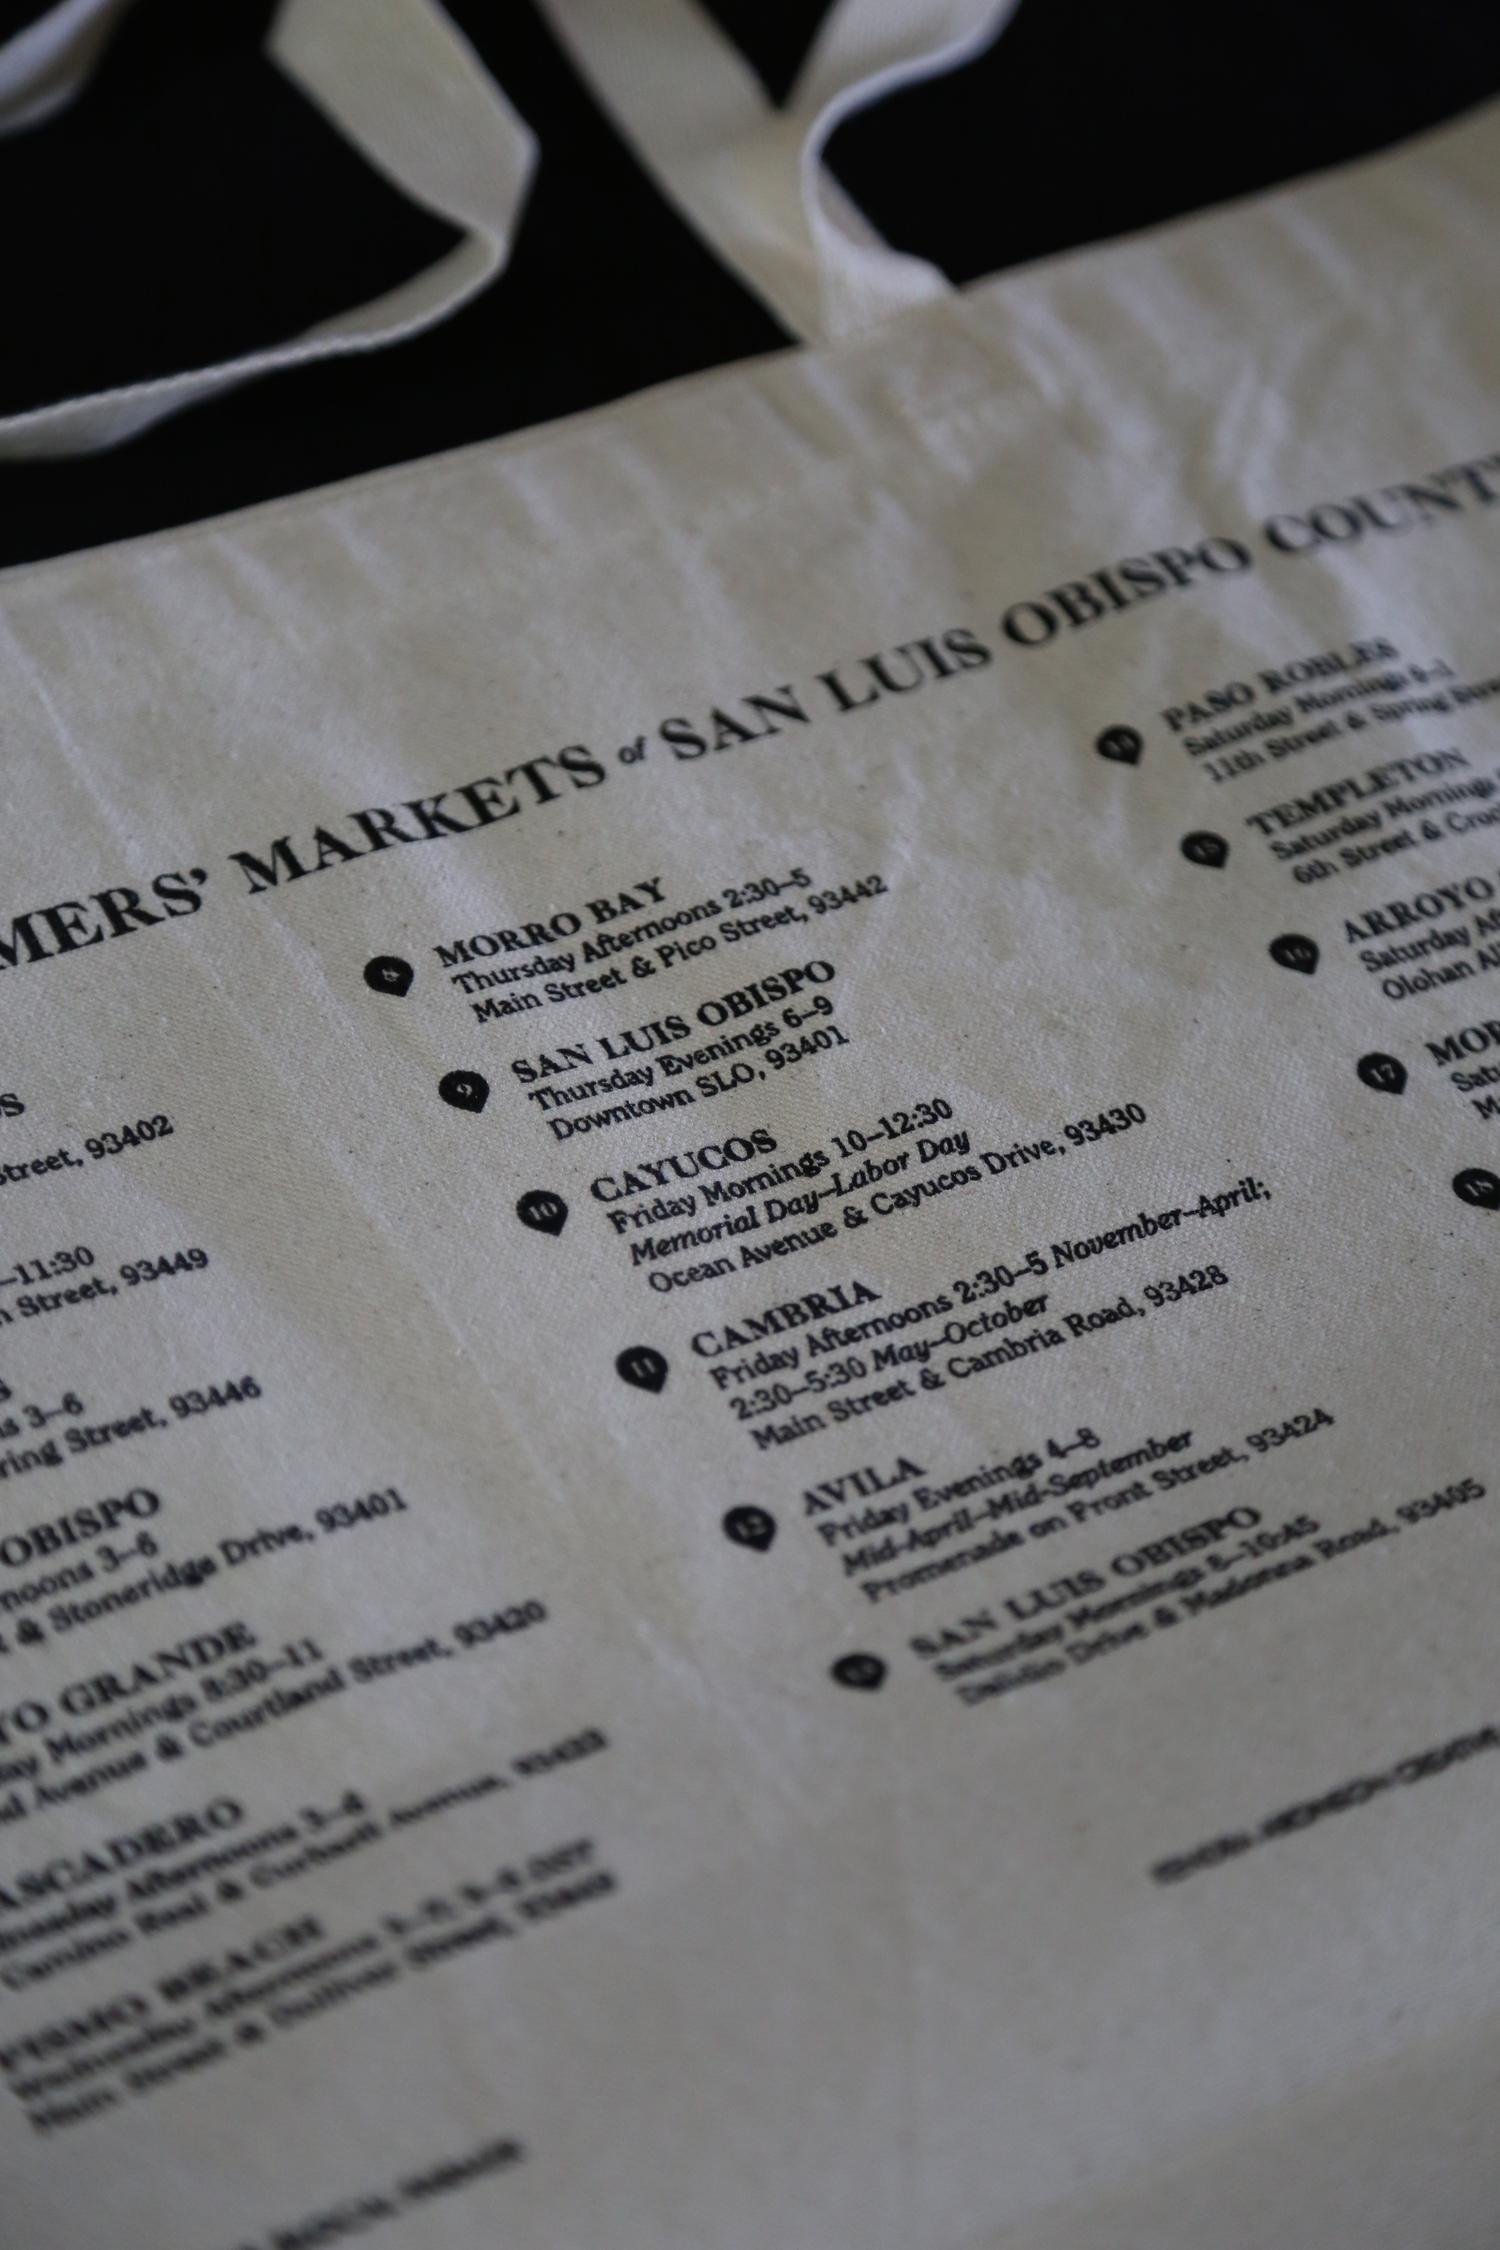 slo-farmers-market-cookbook-tote-bag.jpg